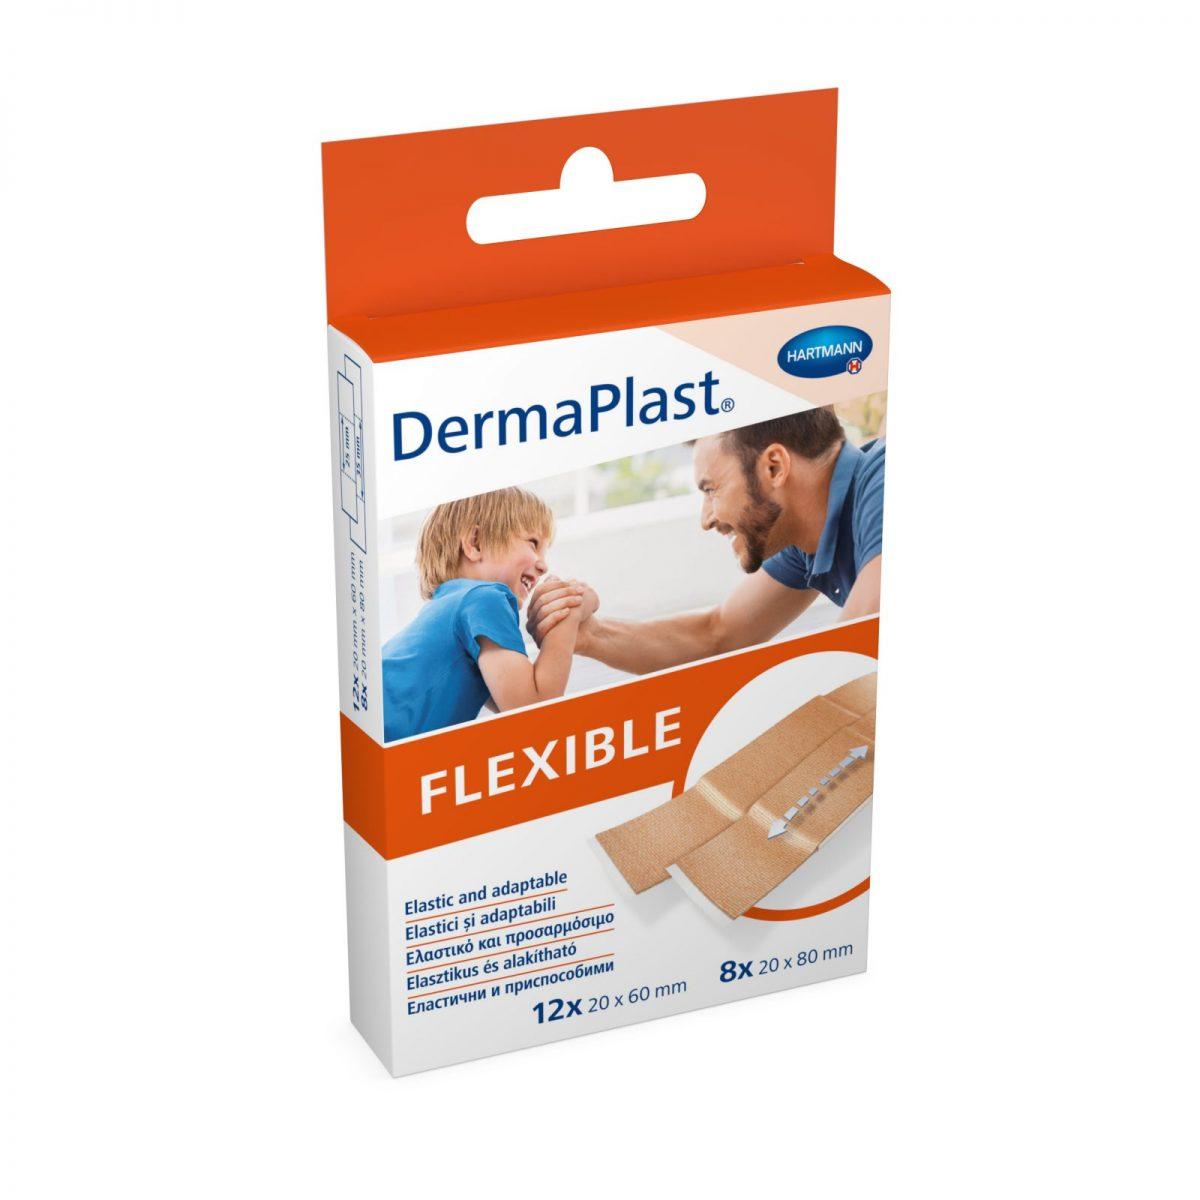 DermaPlast flexible